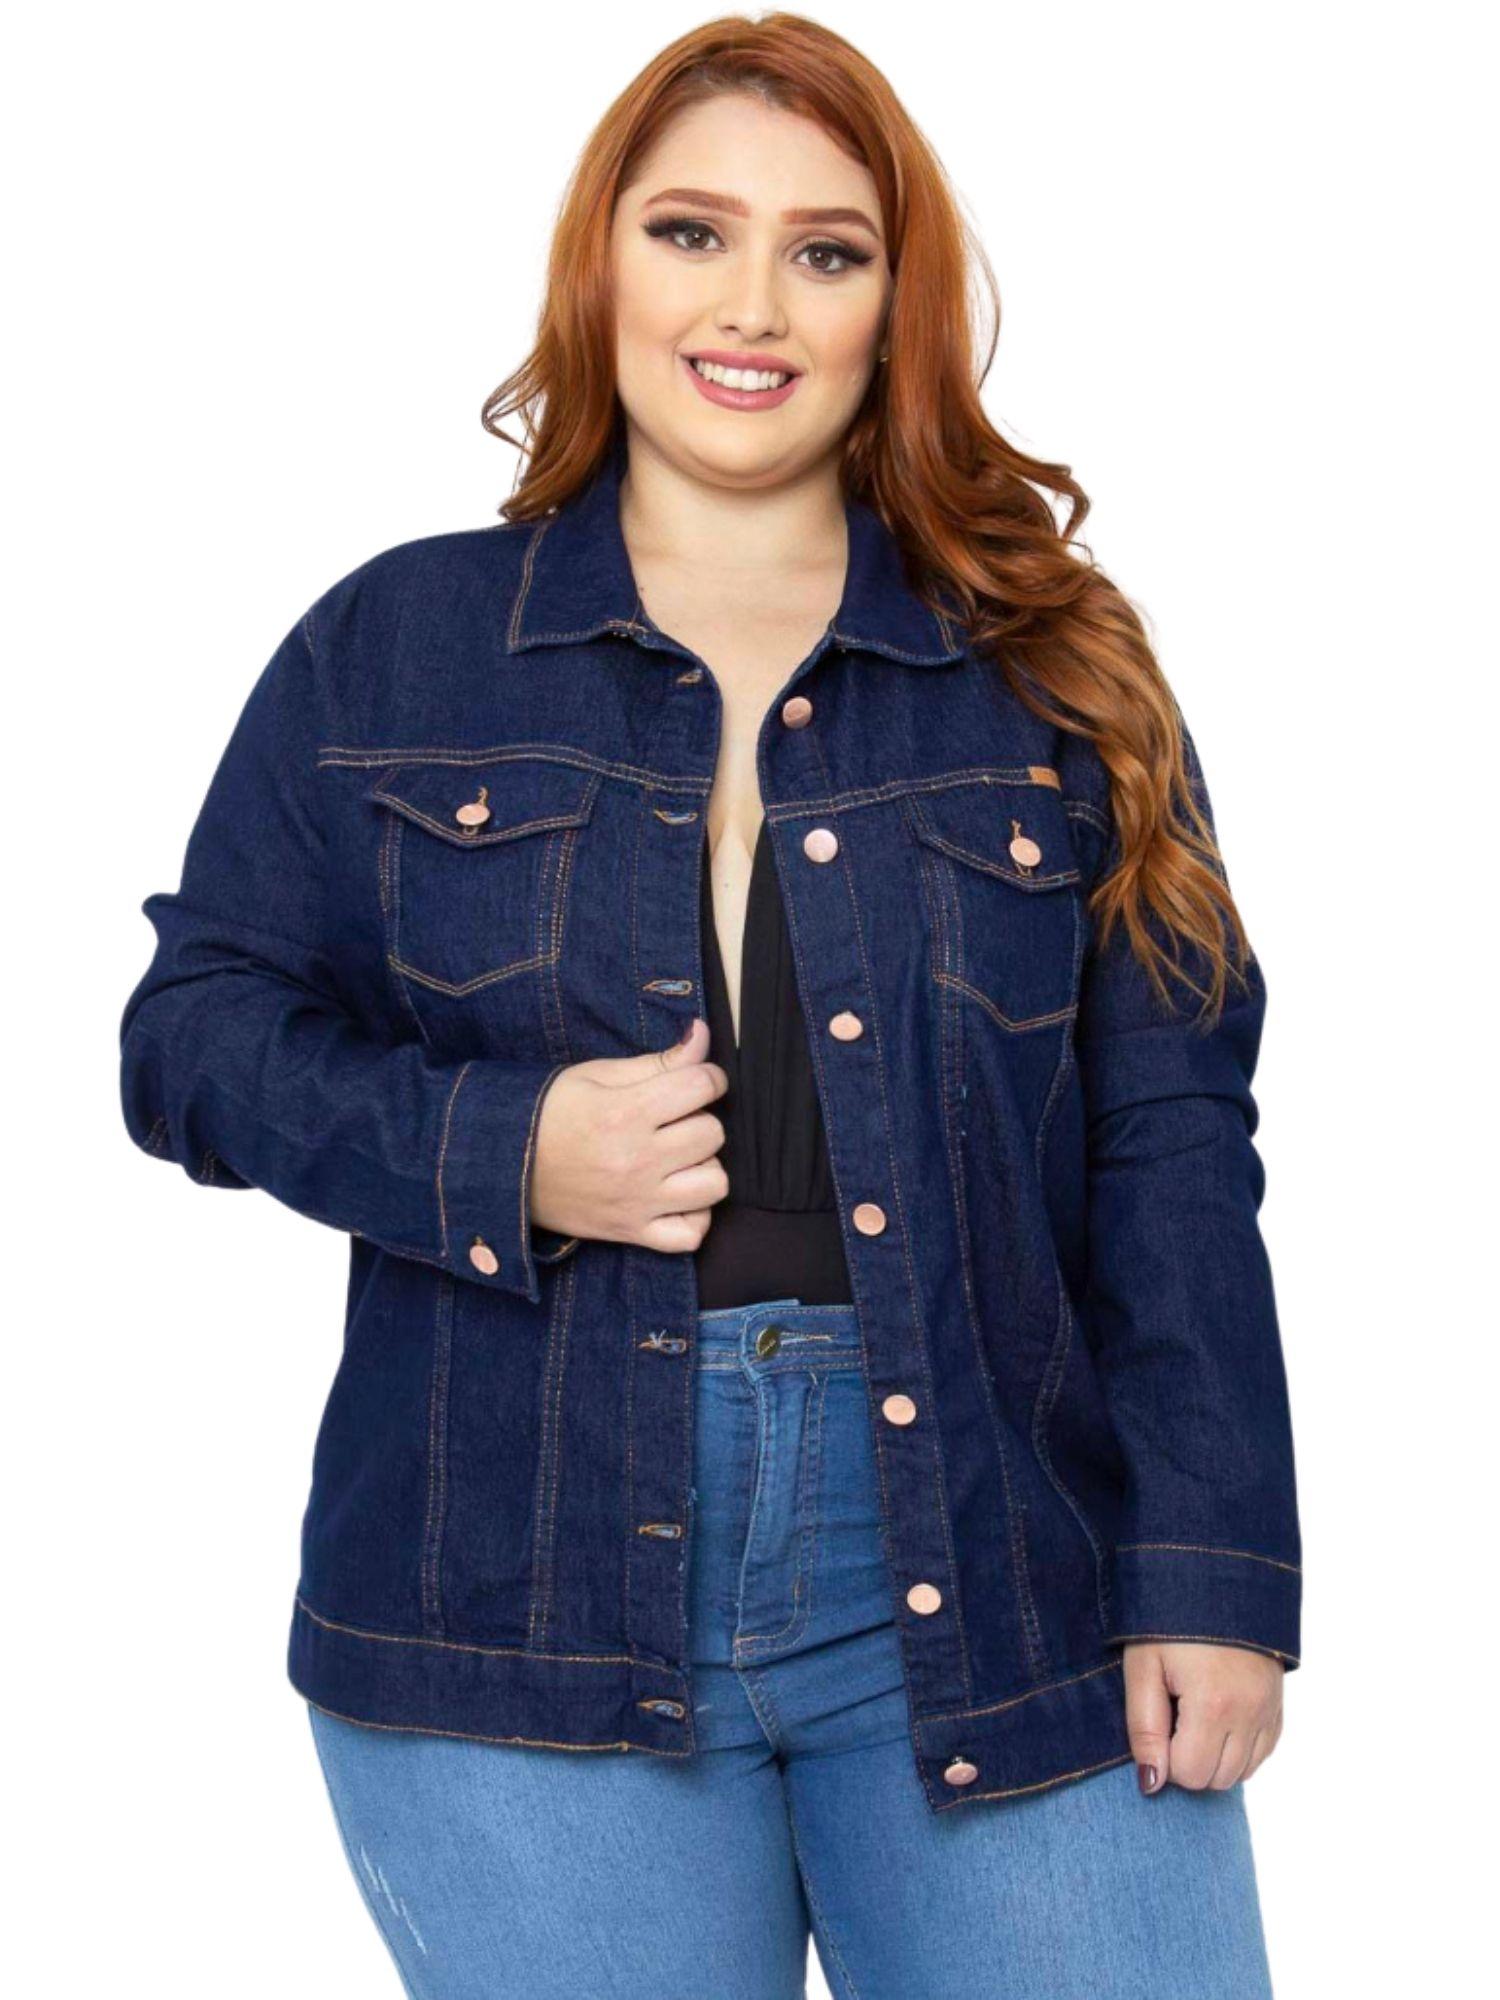 Jaqueta Feminina Jeans Plus Size Tnw Jeans 52024